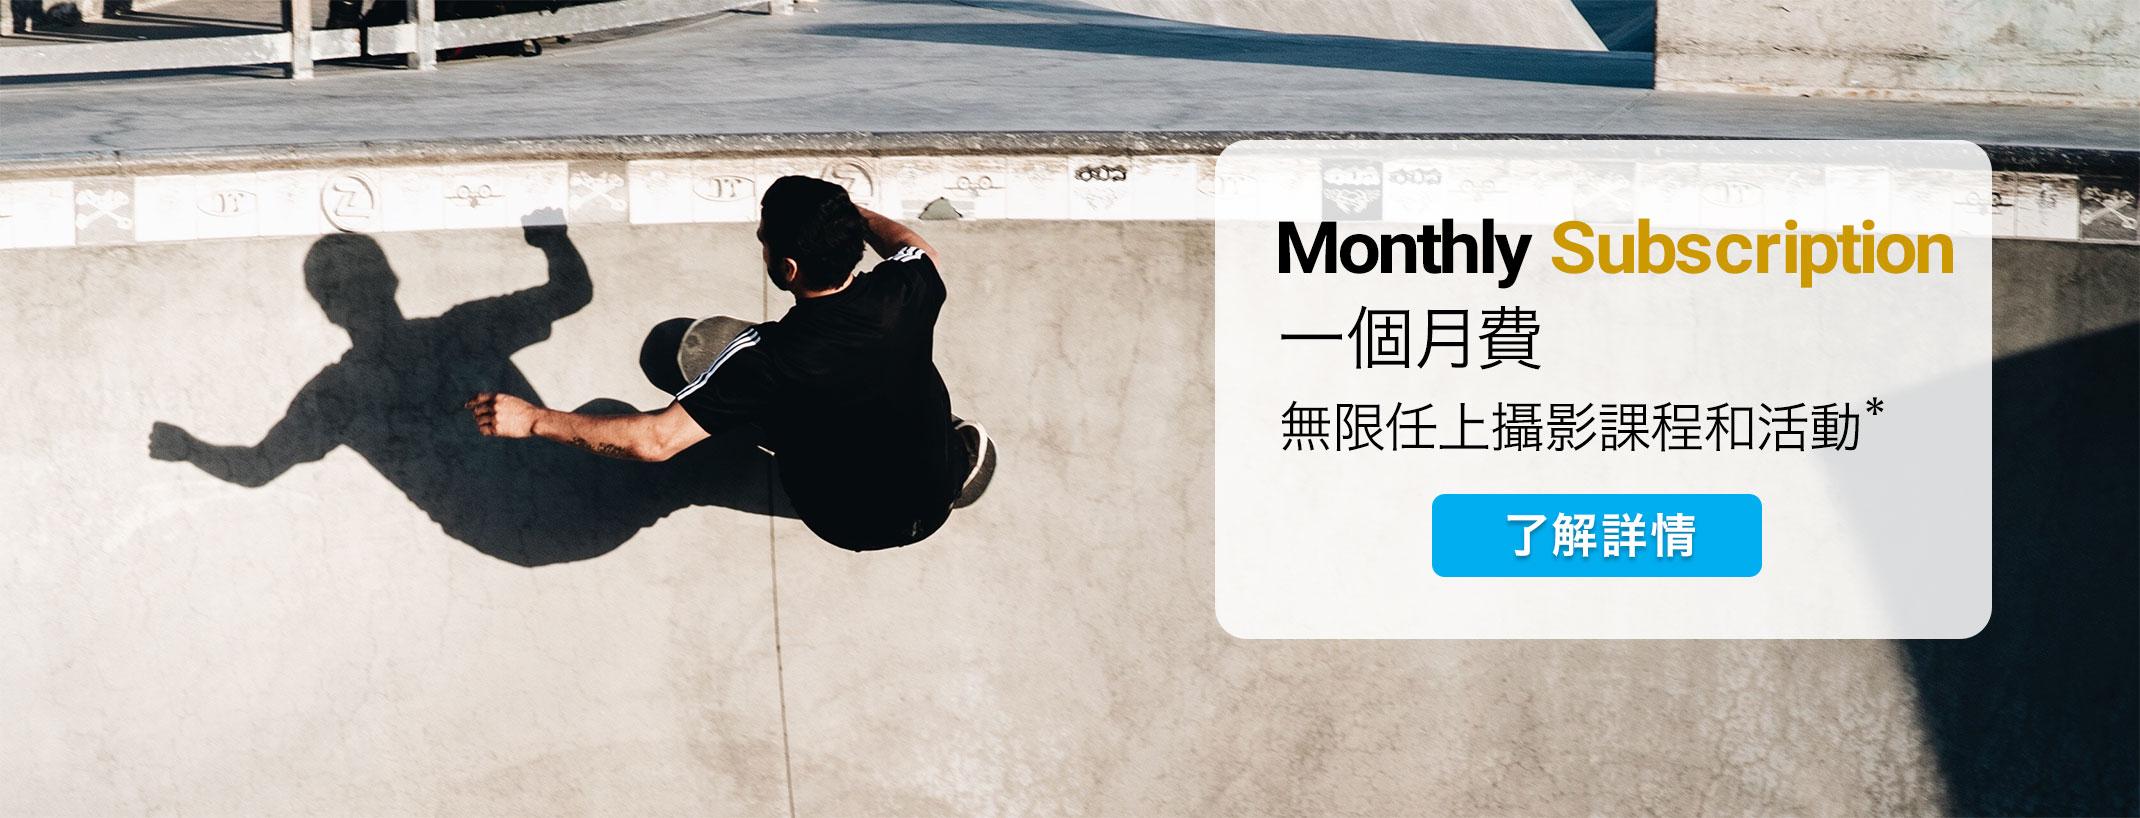 參加 Fotobeginner 月費用戶計劃